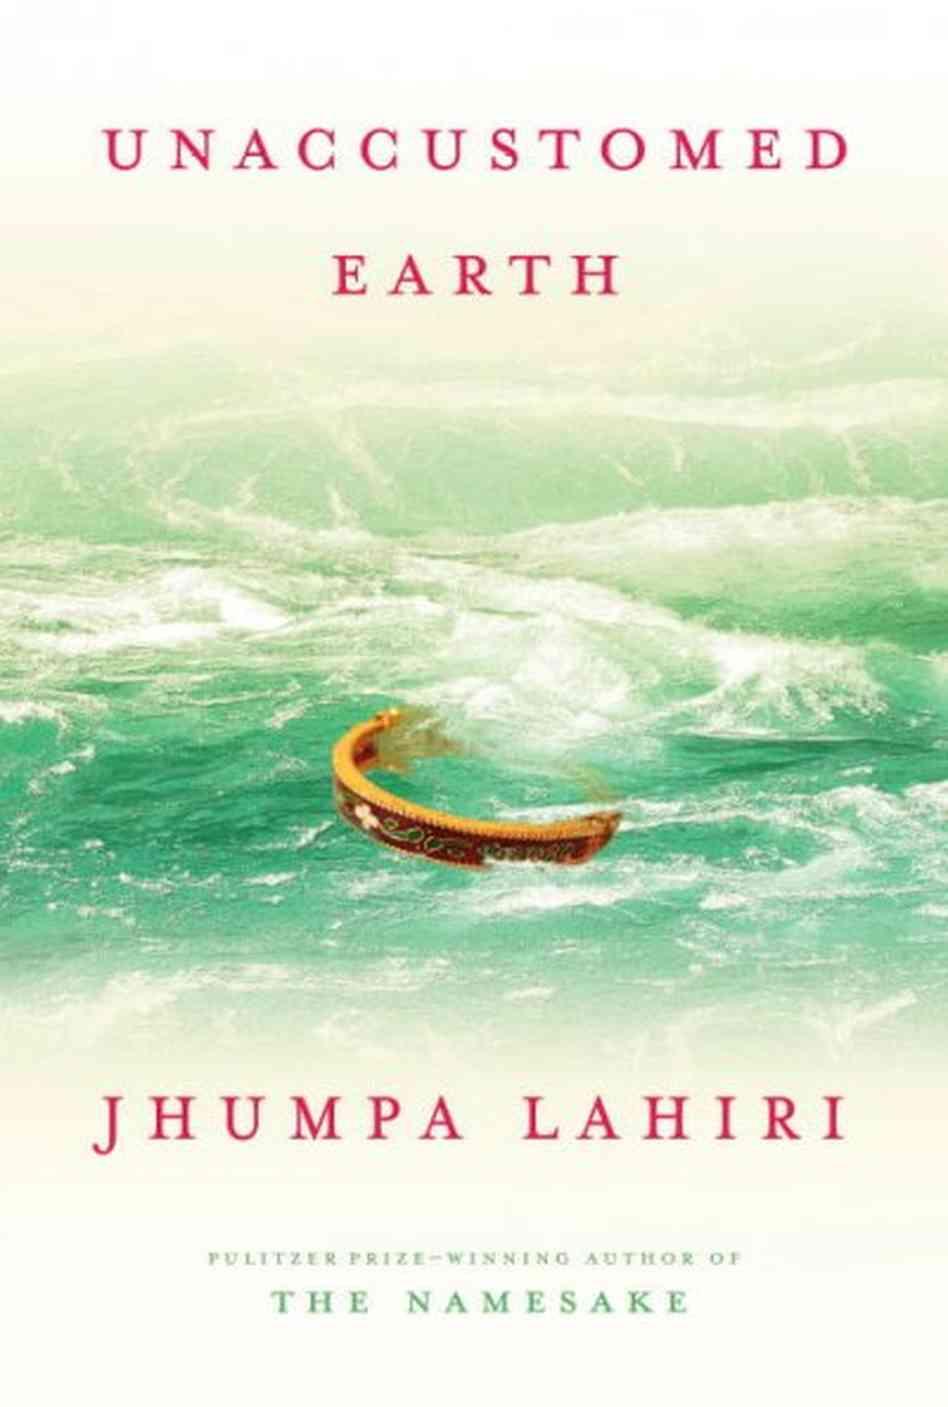 Unaccustomed-Earth.jpg